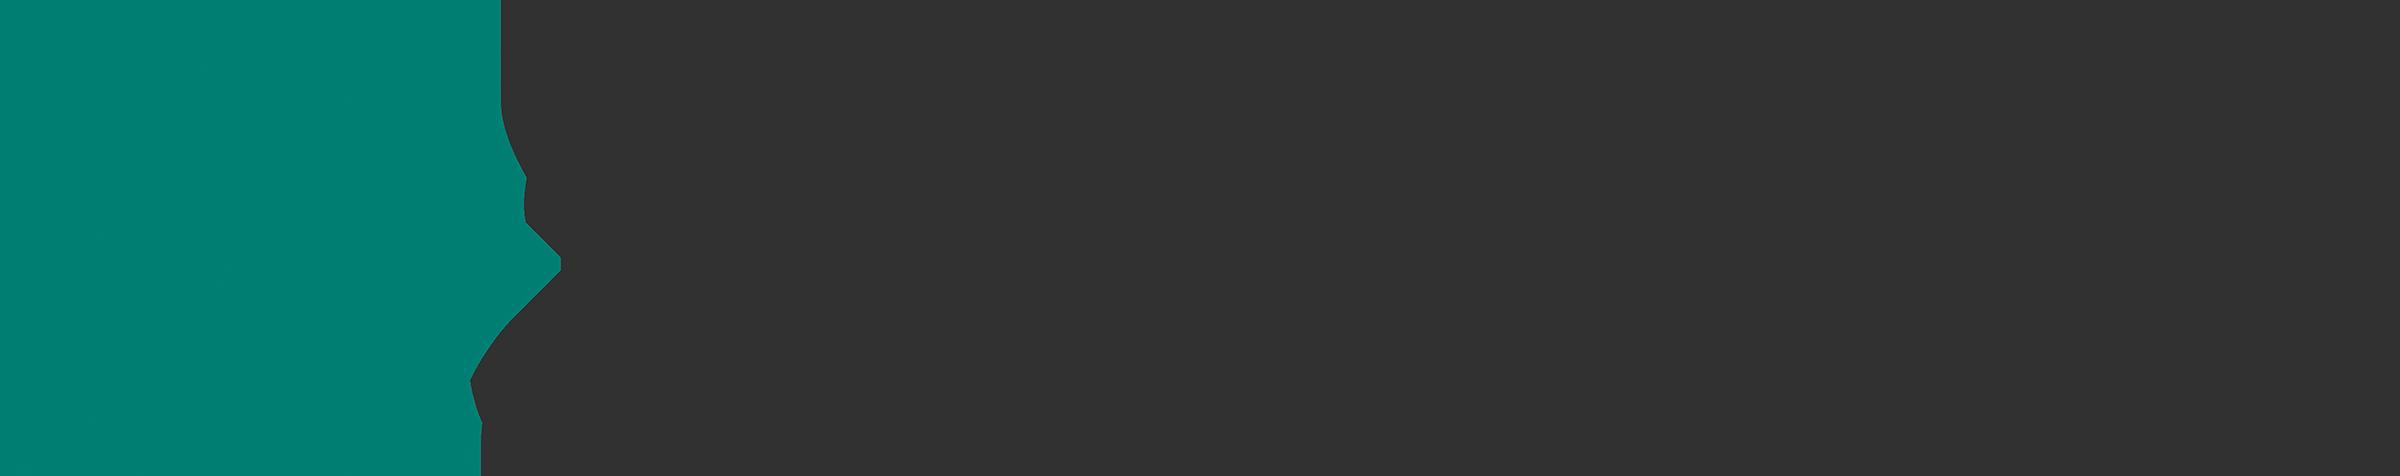 Canadians for Carbon Dividends